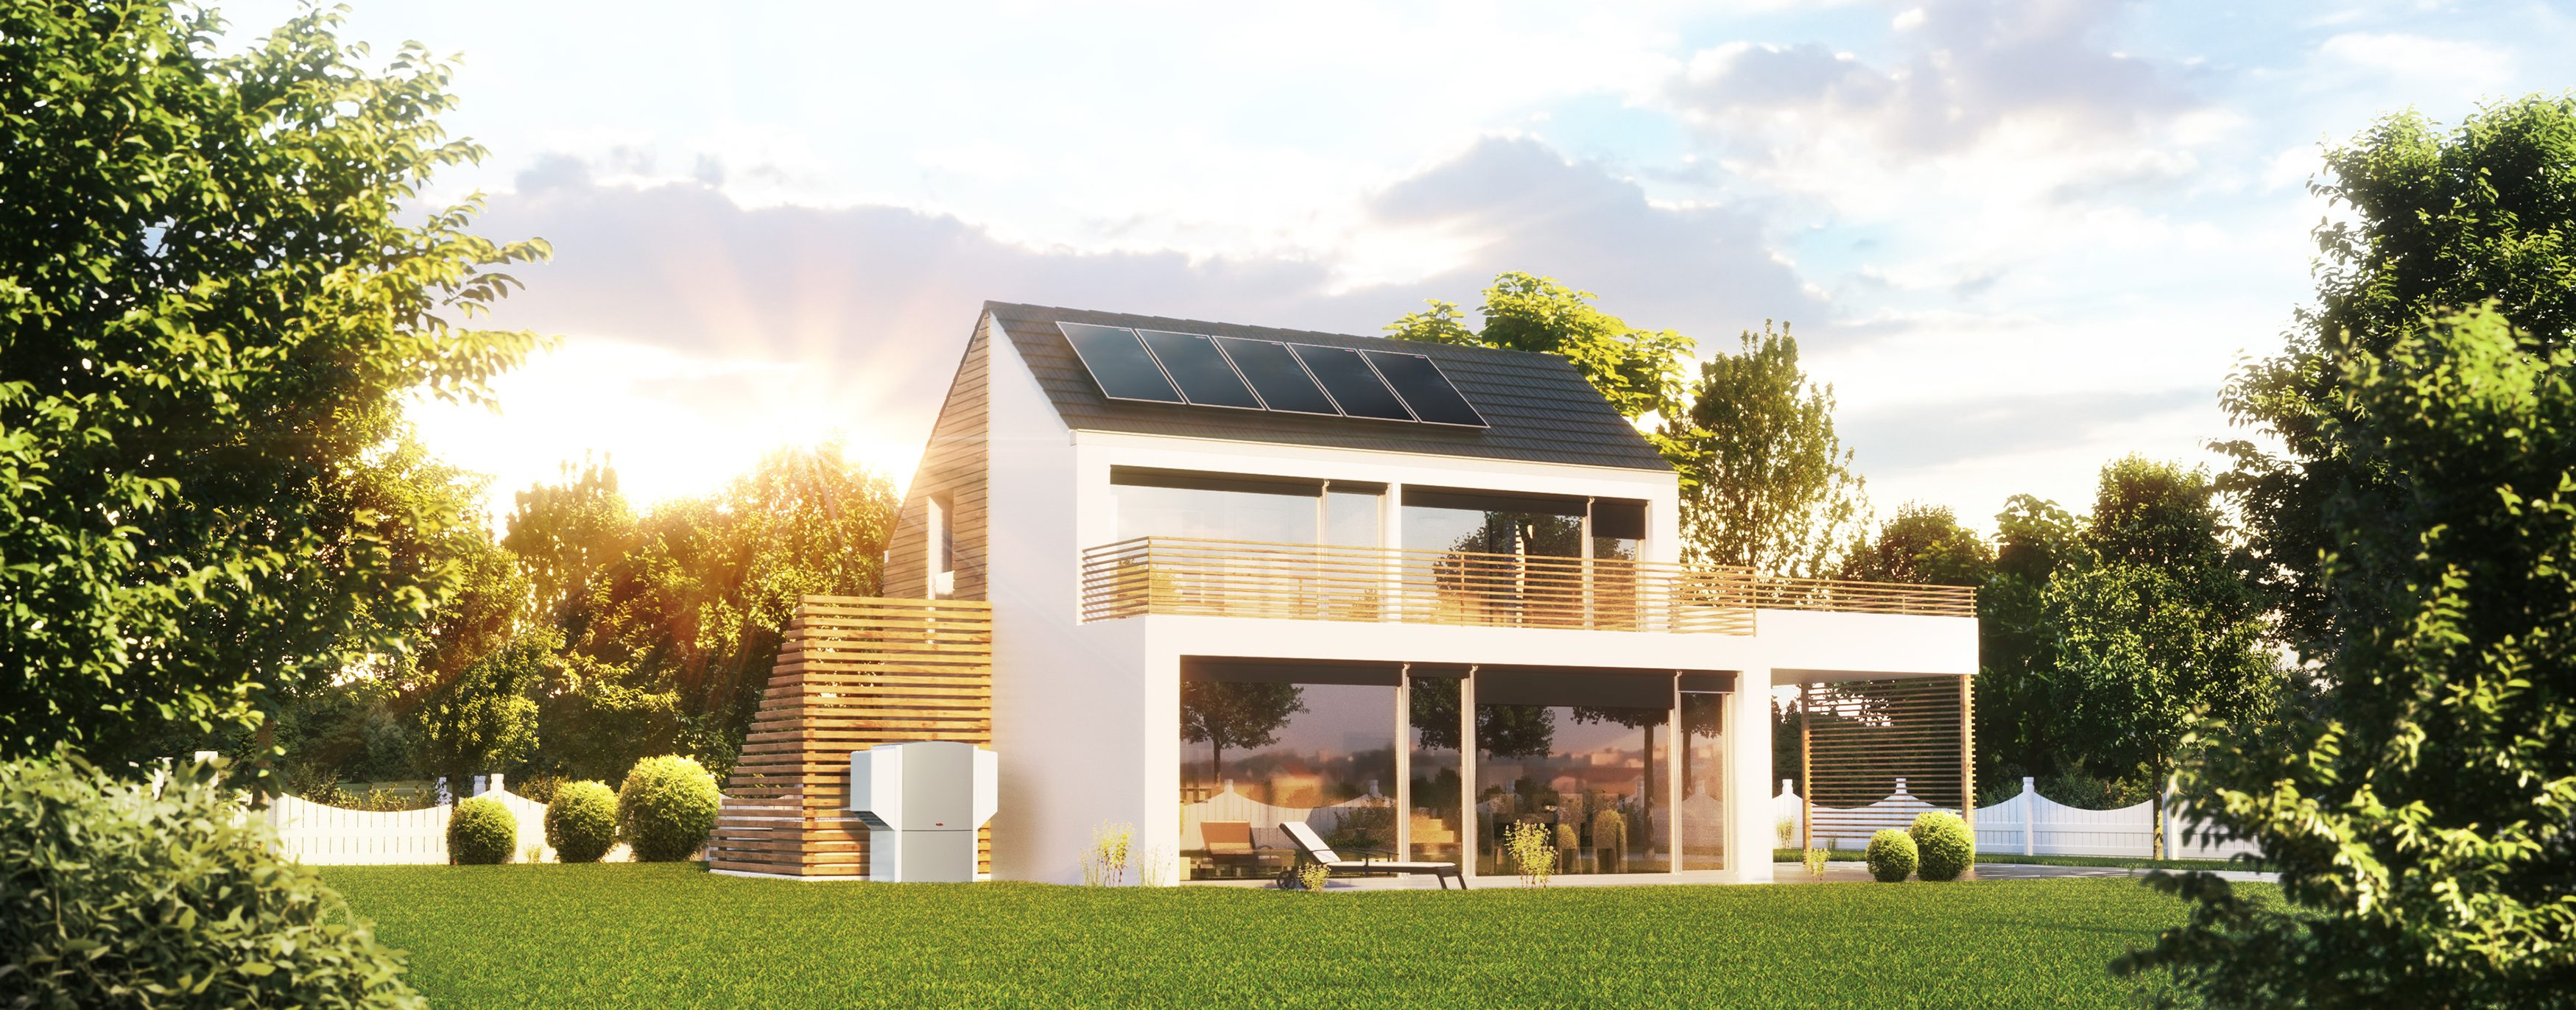 WOLF - Solarhaus - Flachkollektor